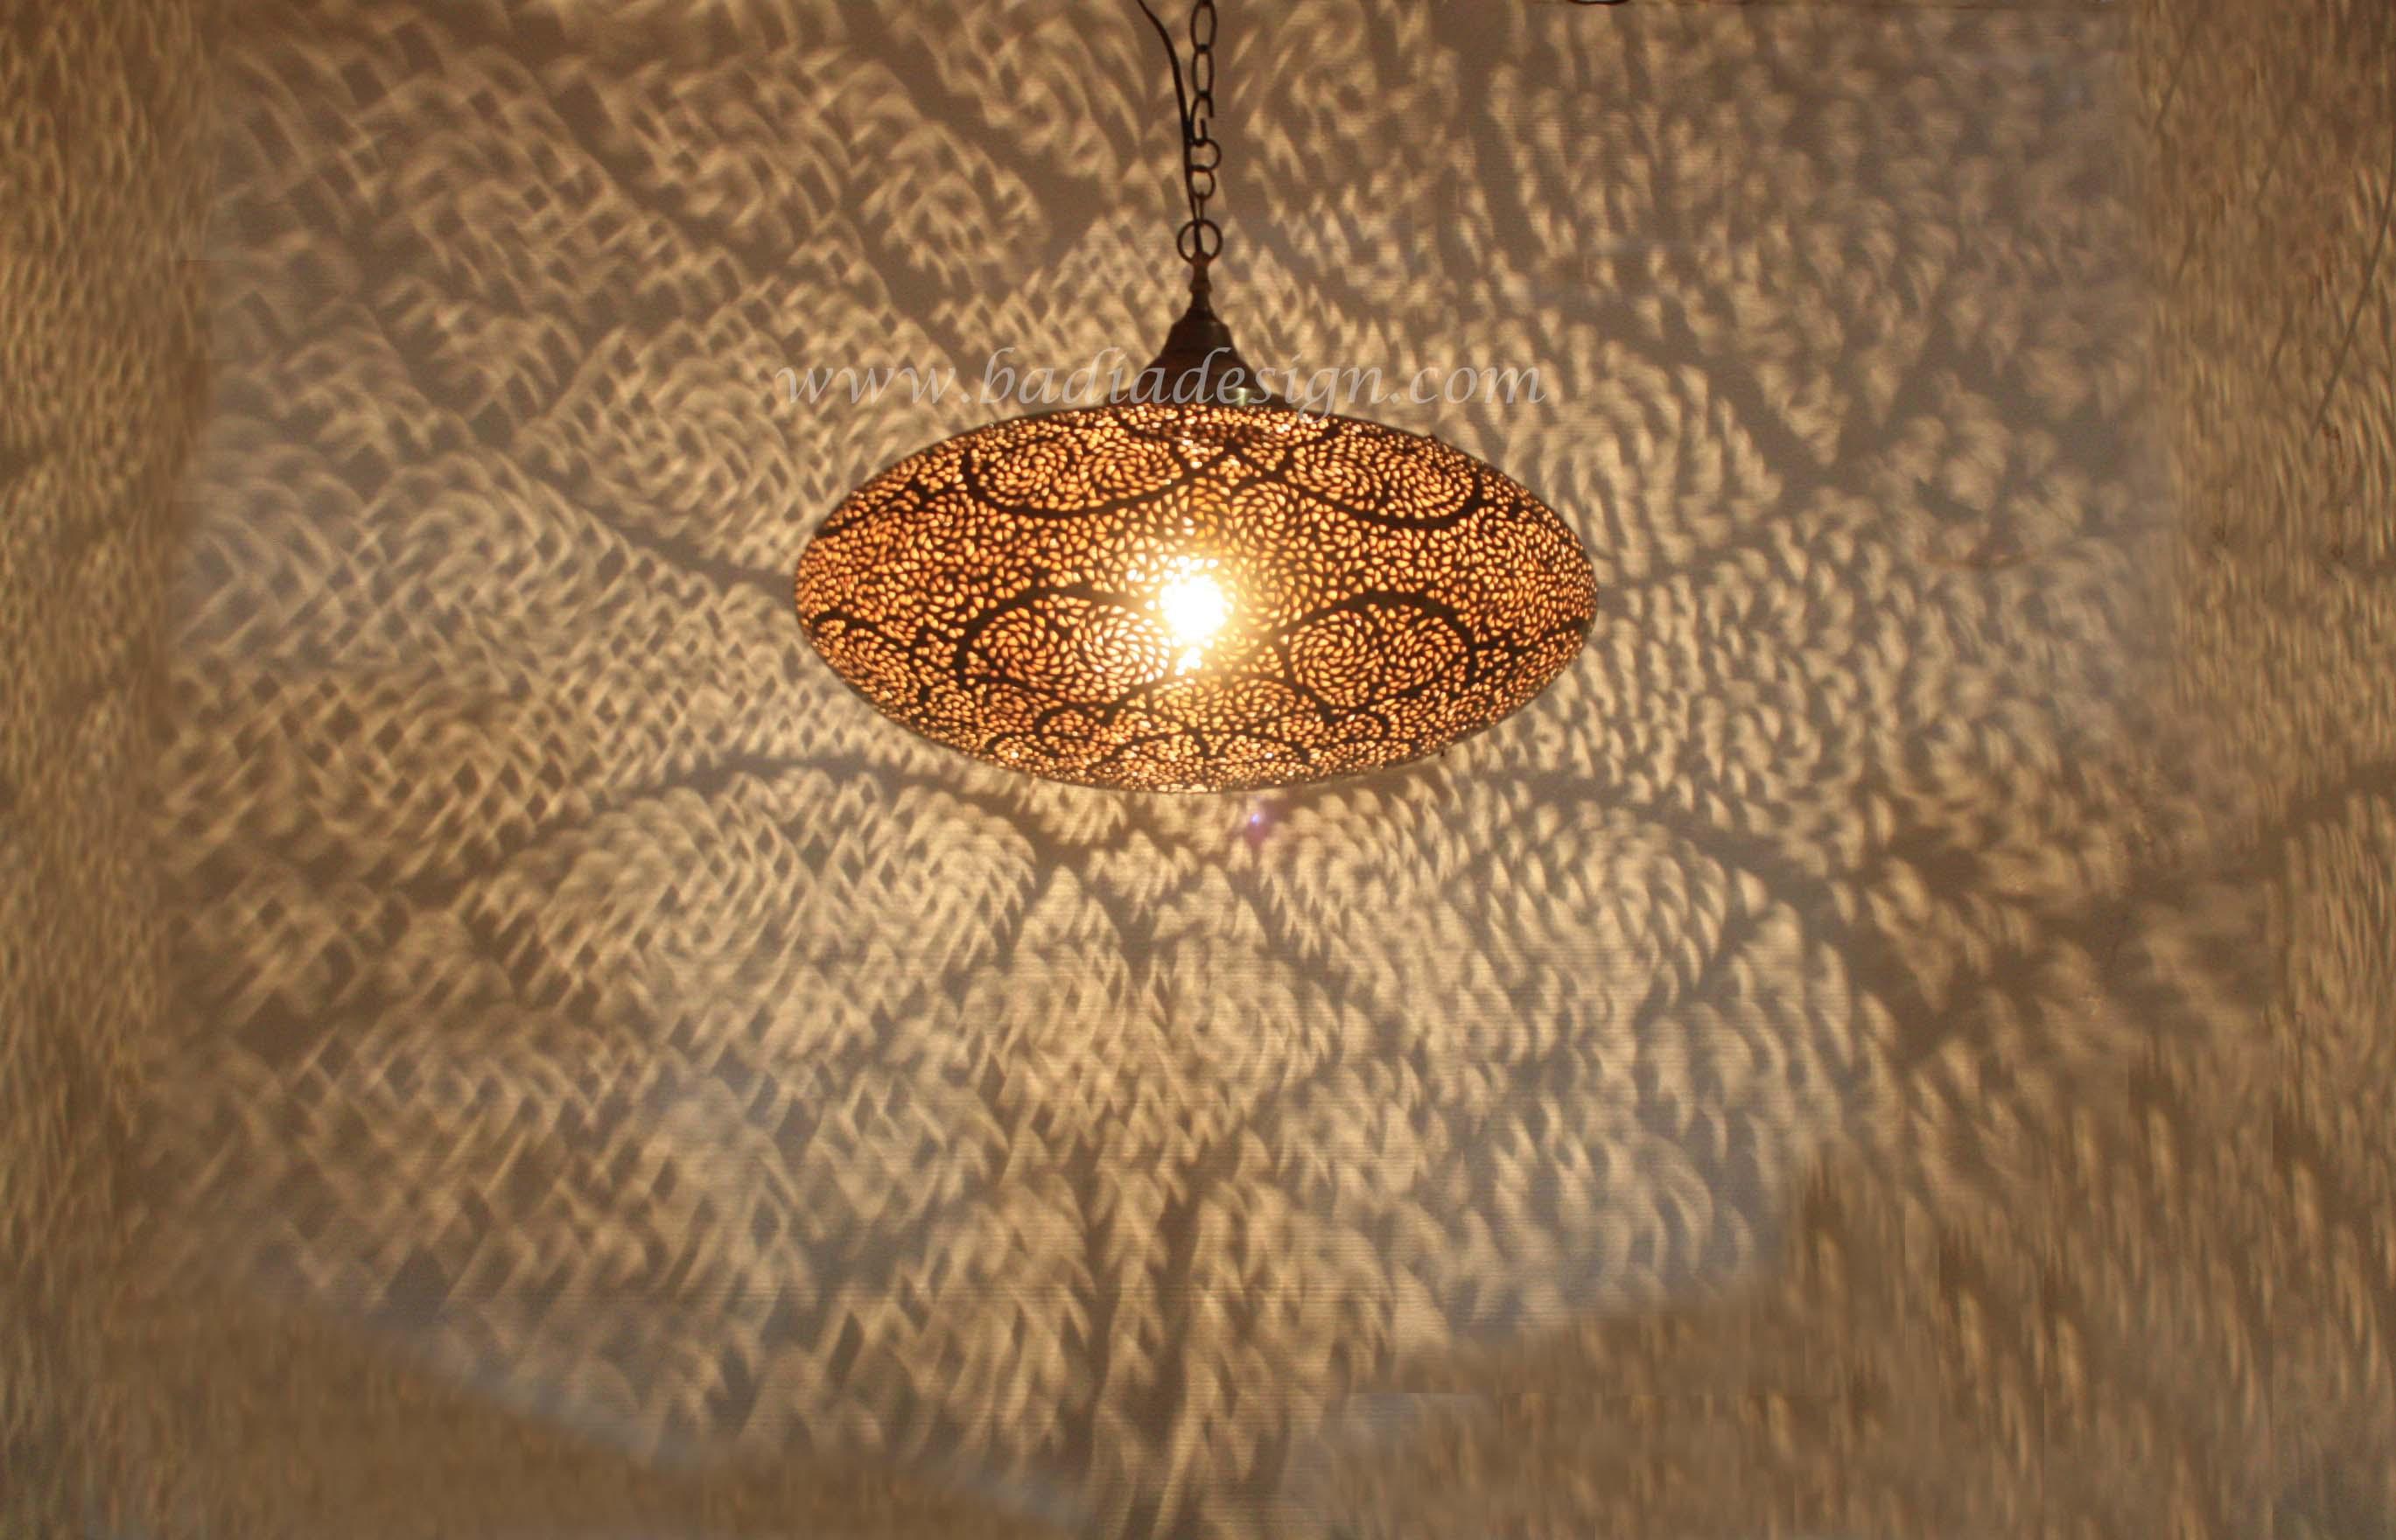 moroccan-saucer-shaped-lantern-lig301-1.jpg